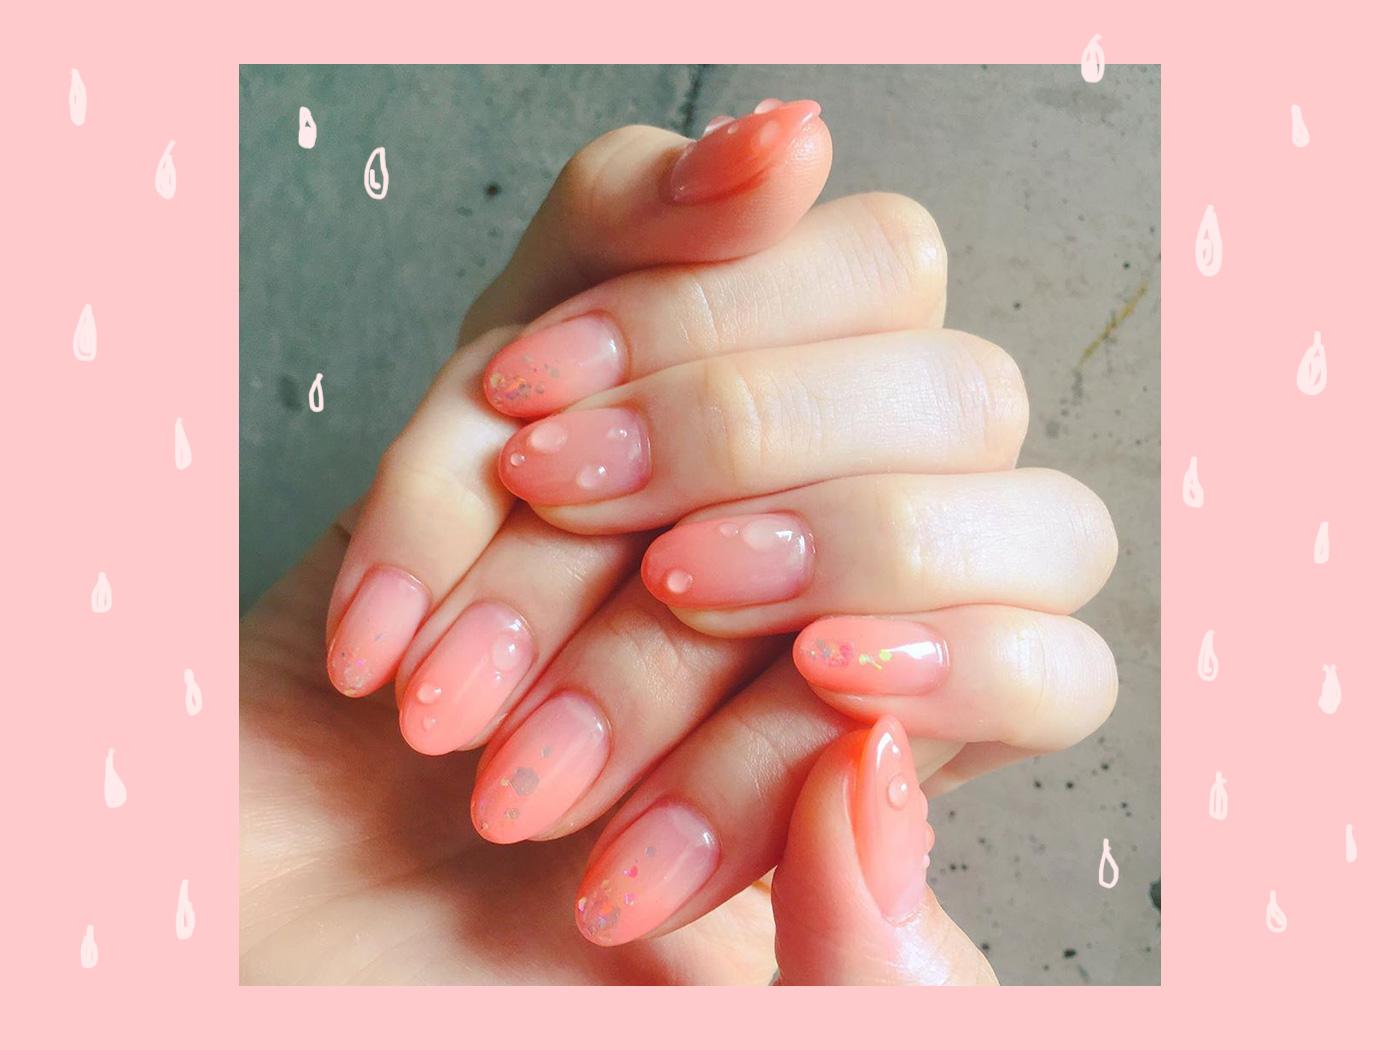 Raindrop nails! Τα… βρεγμένα νύχια είναι το επόμενο nail art που θα κάνουμε!